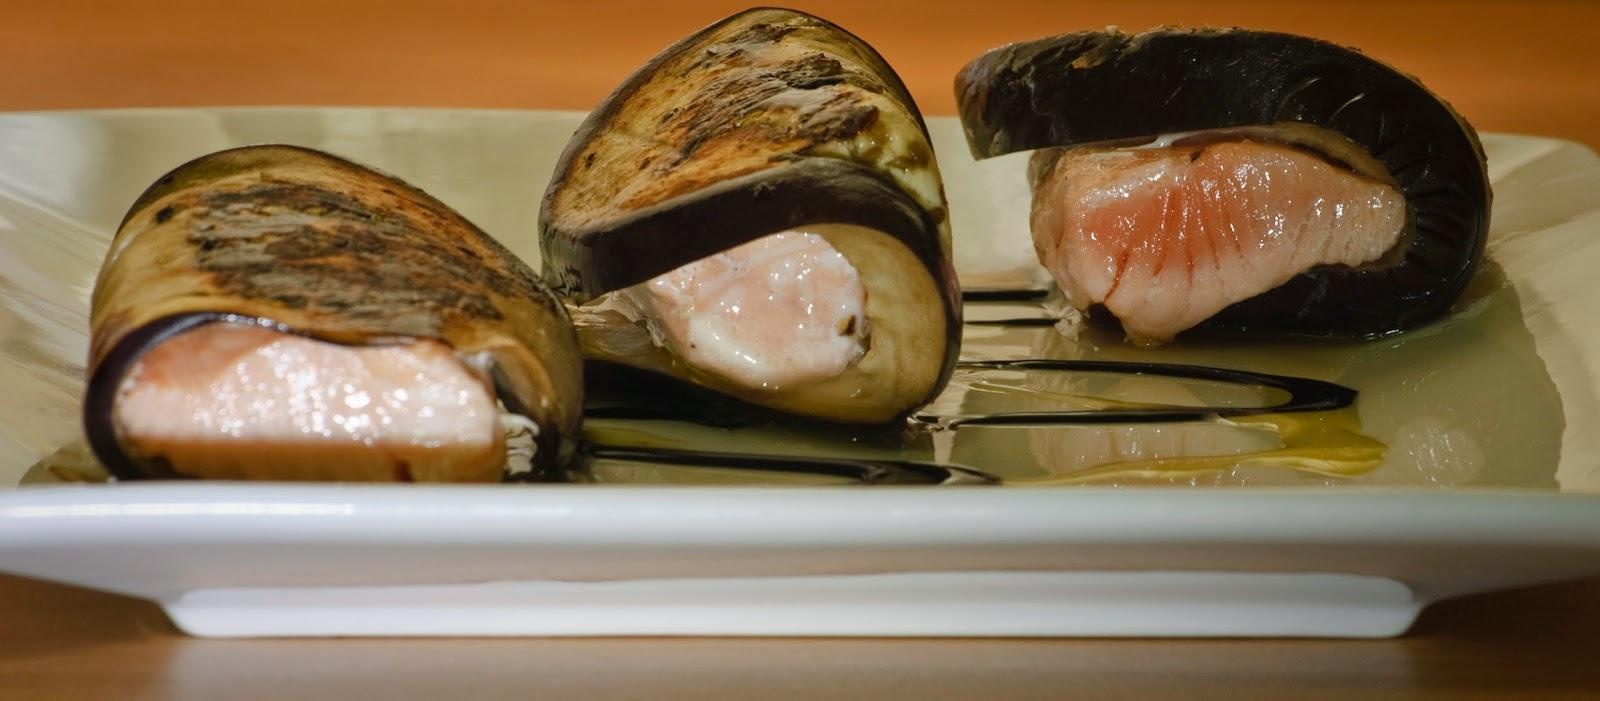 Pincho de berenjena y salmón; eggplant and salmon appetizer